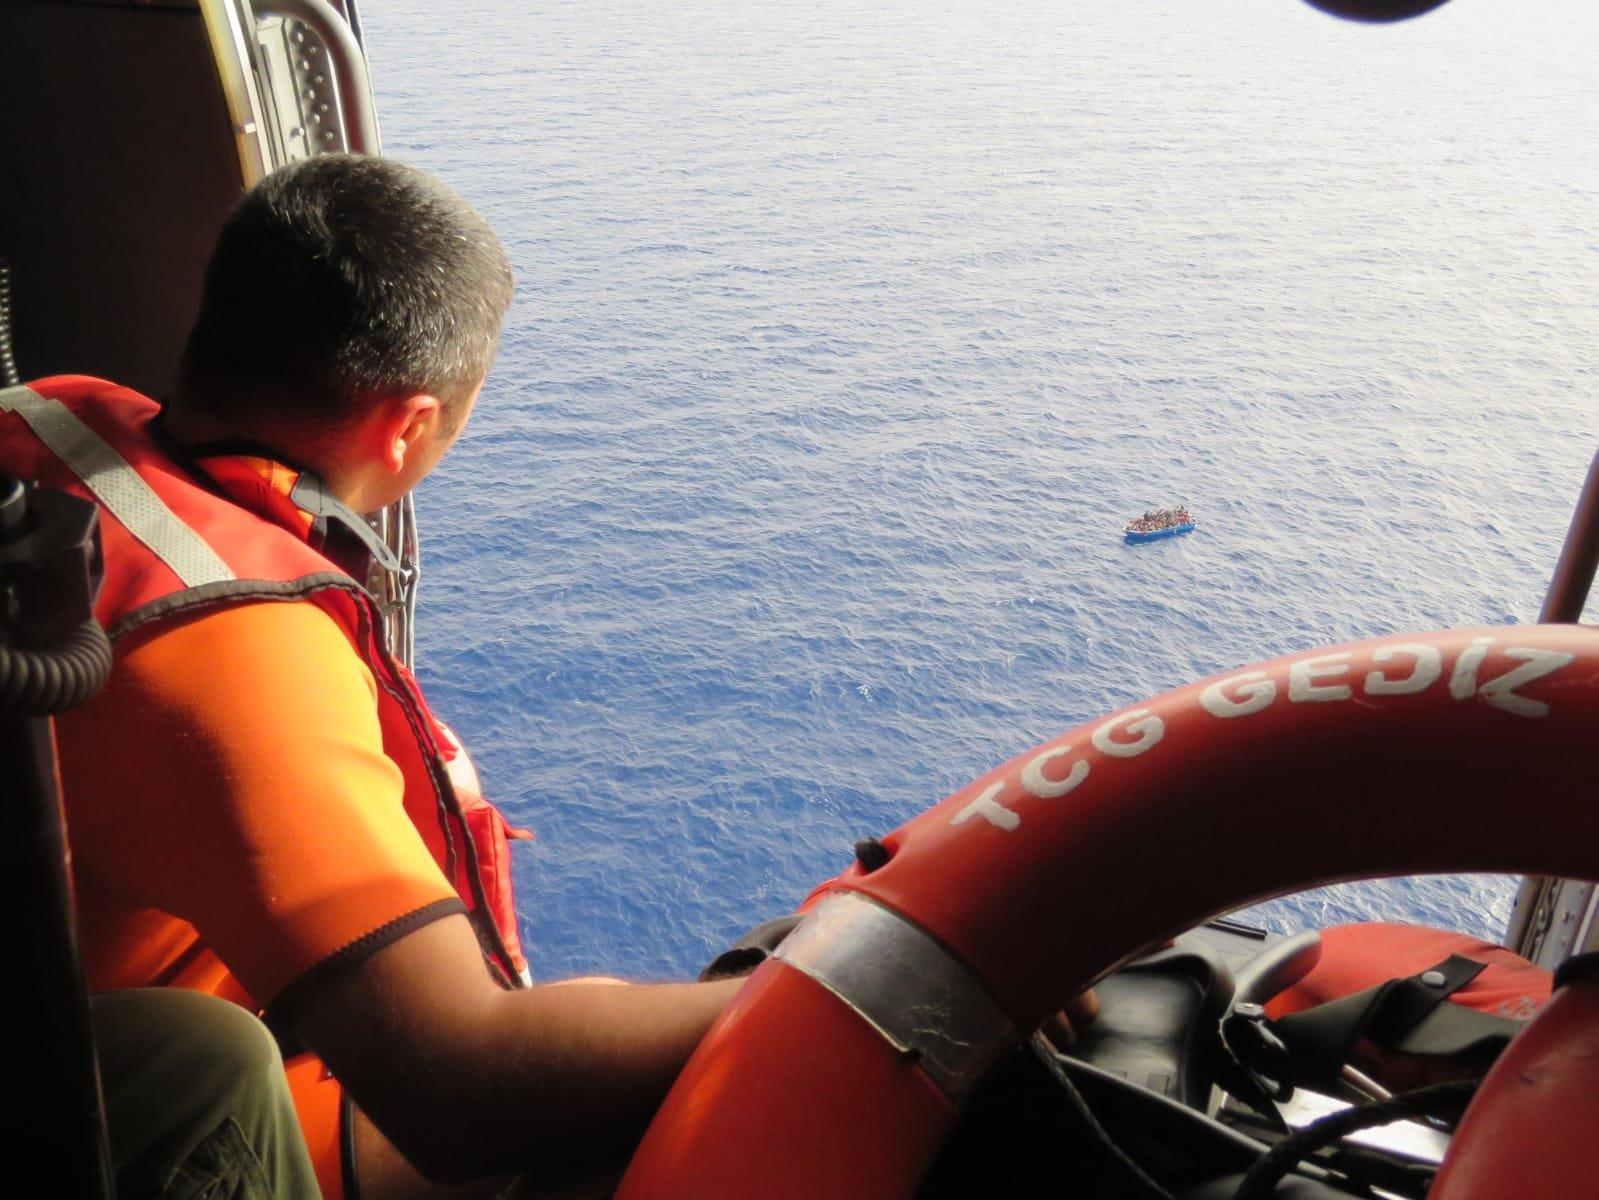 Turkey's TCG Gediz Frigate is on a mission rescuing migrants in the Mediterranean, July 18, 2021 (AA Photo)